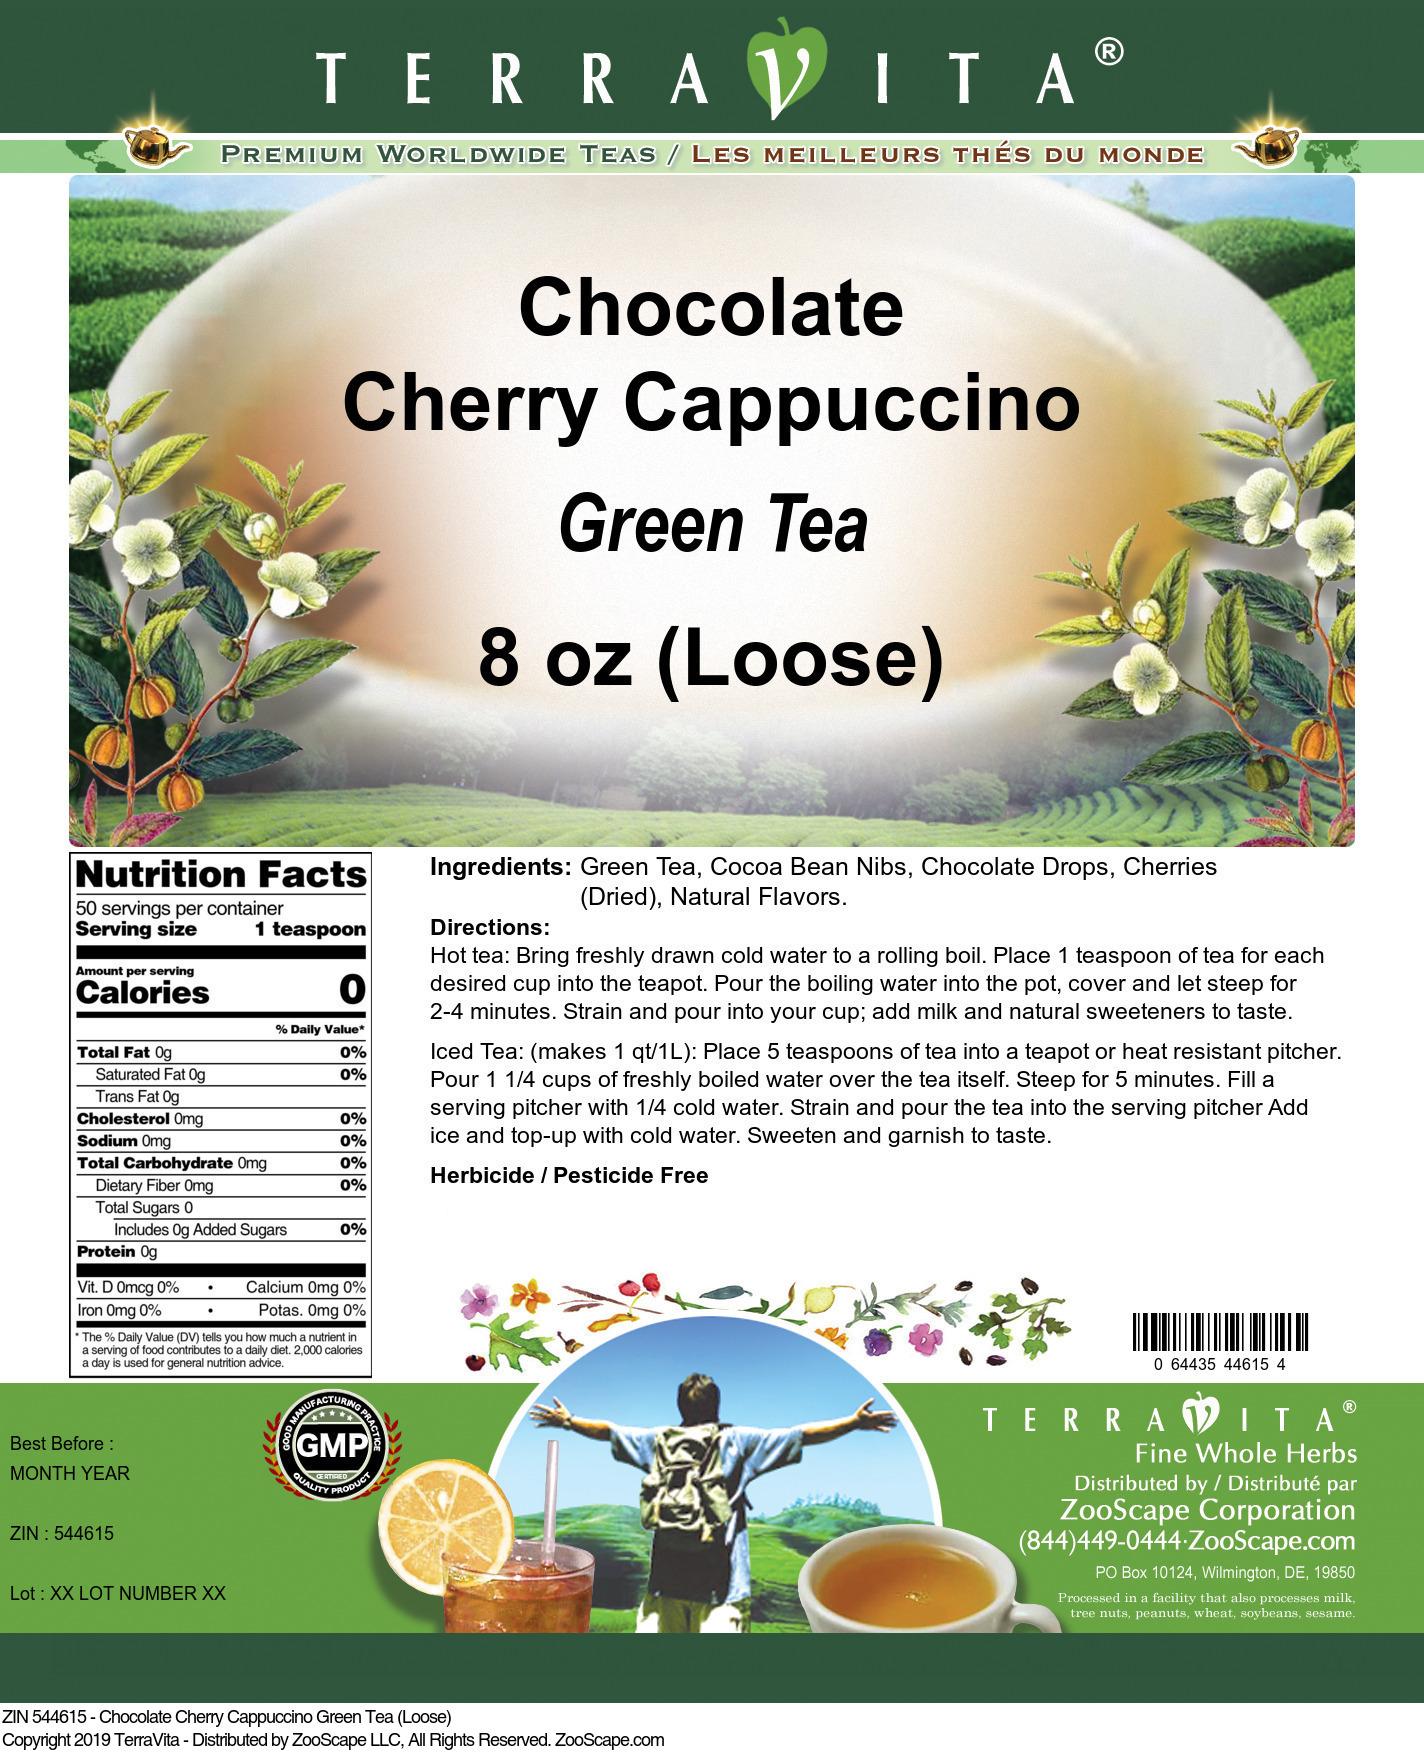 Chocolate Cherry Cappuccino Green Tea (Loose)